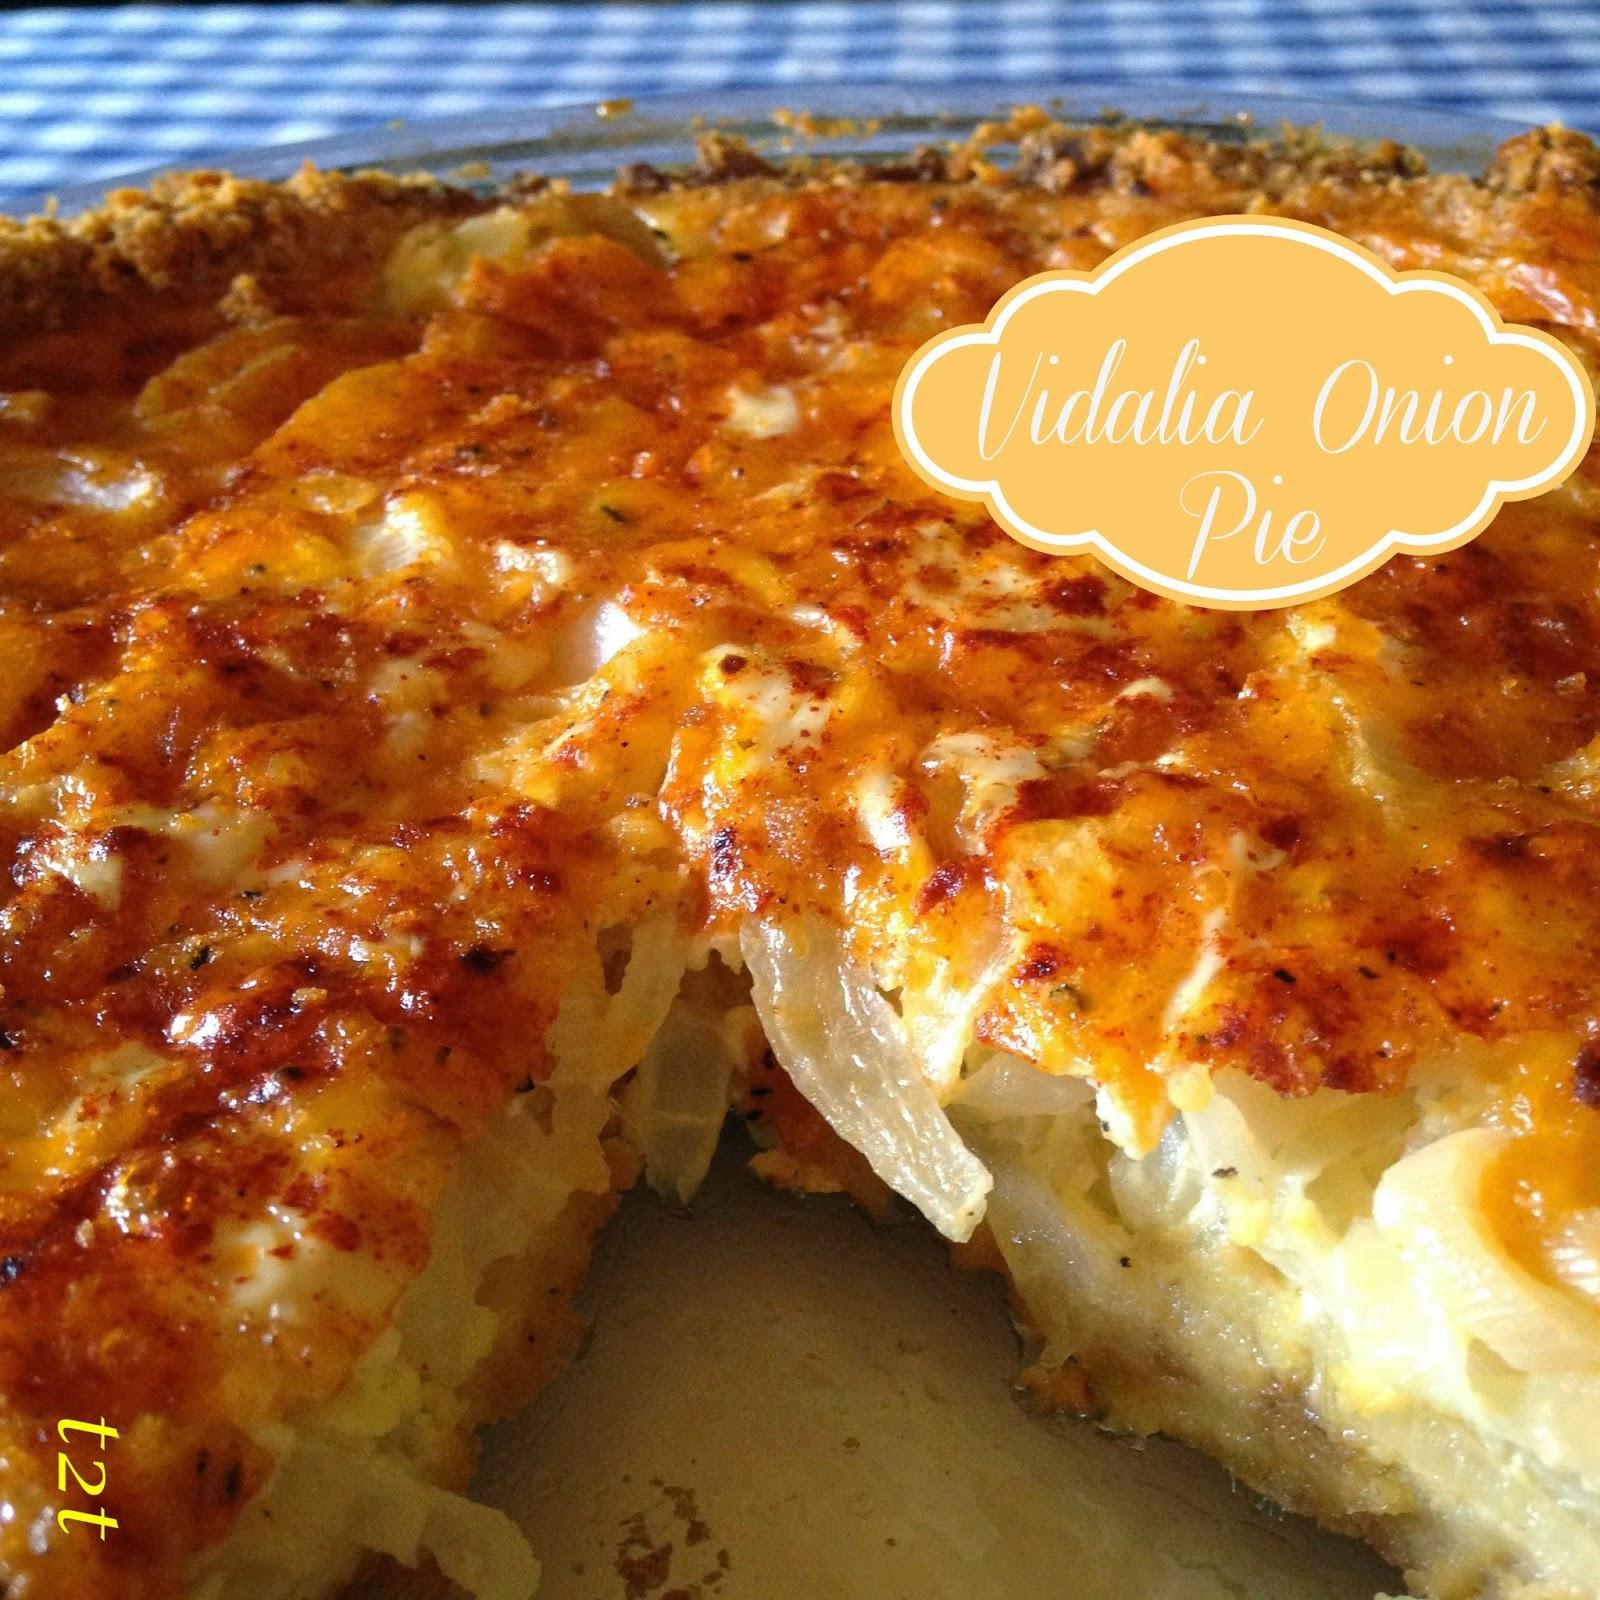 Vadalia Onion Pie  Turnips 2 Tangerines Cheddar and Ritz Cracker Vidalia